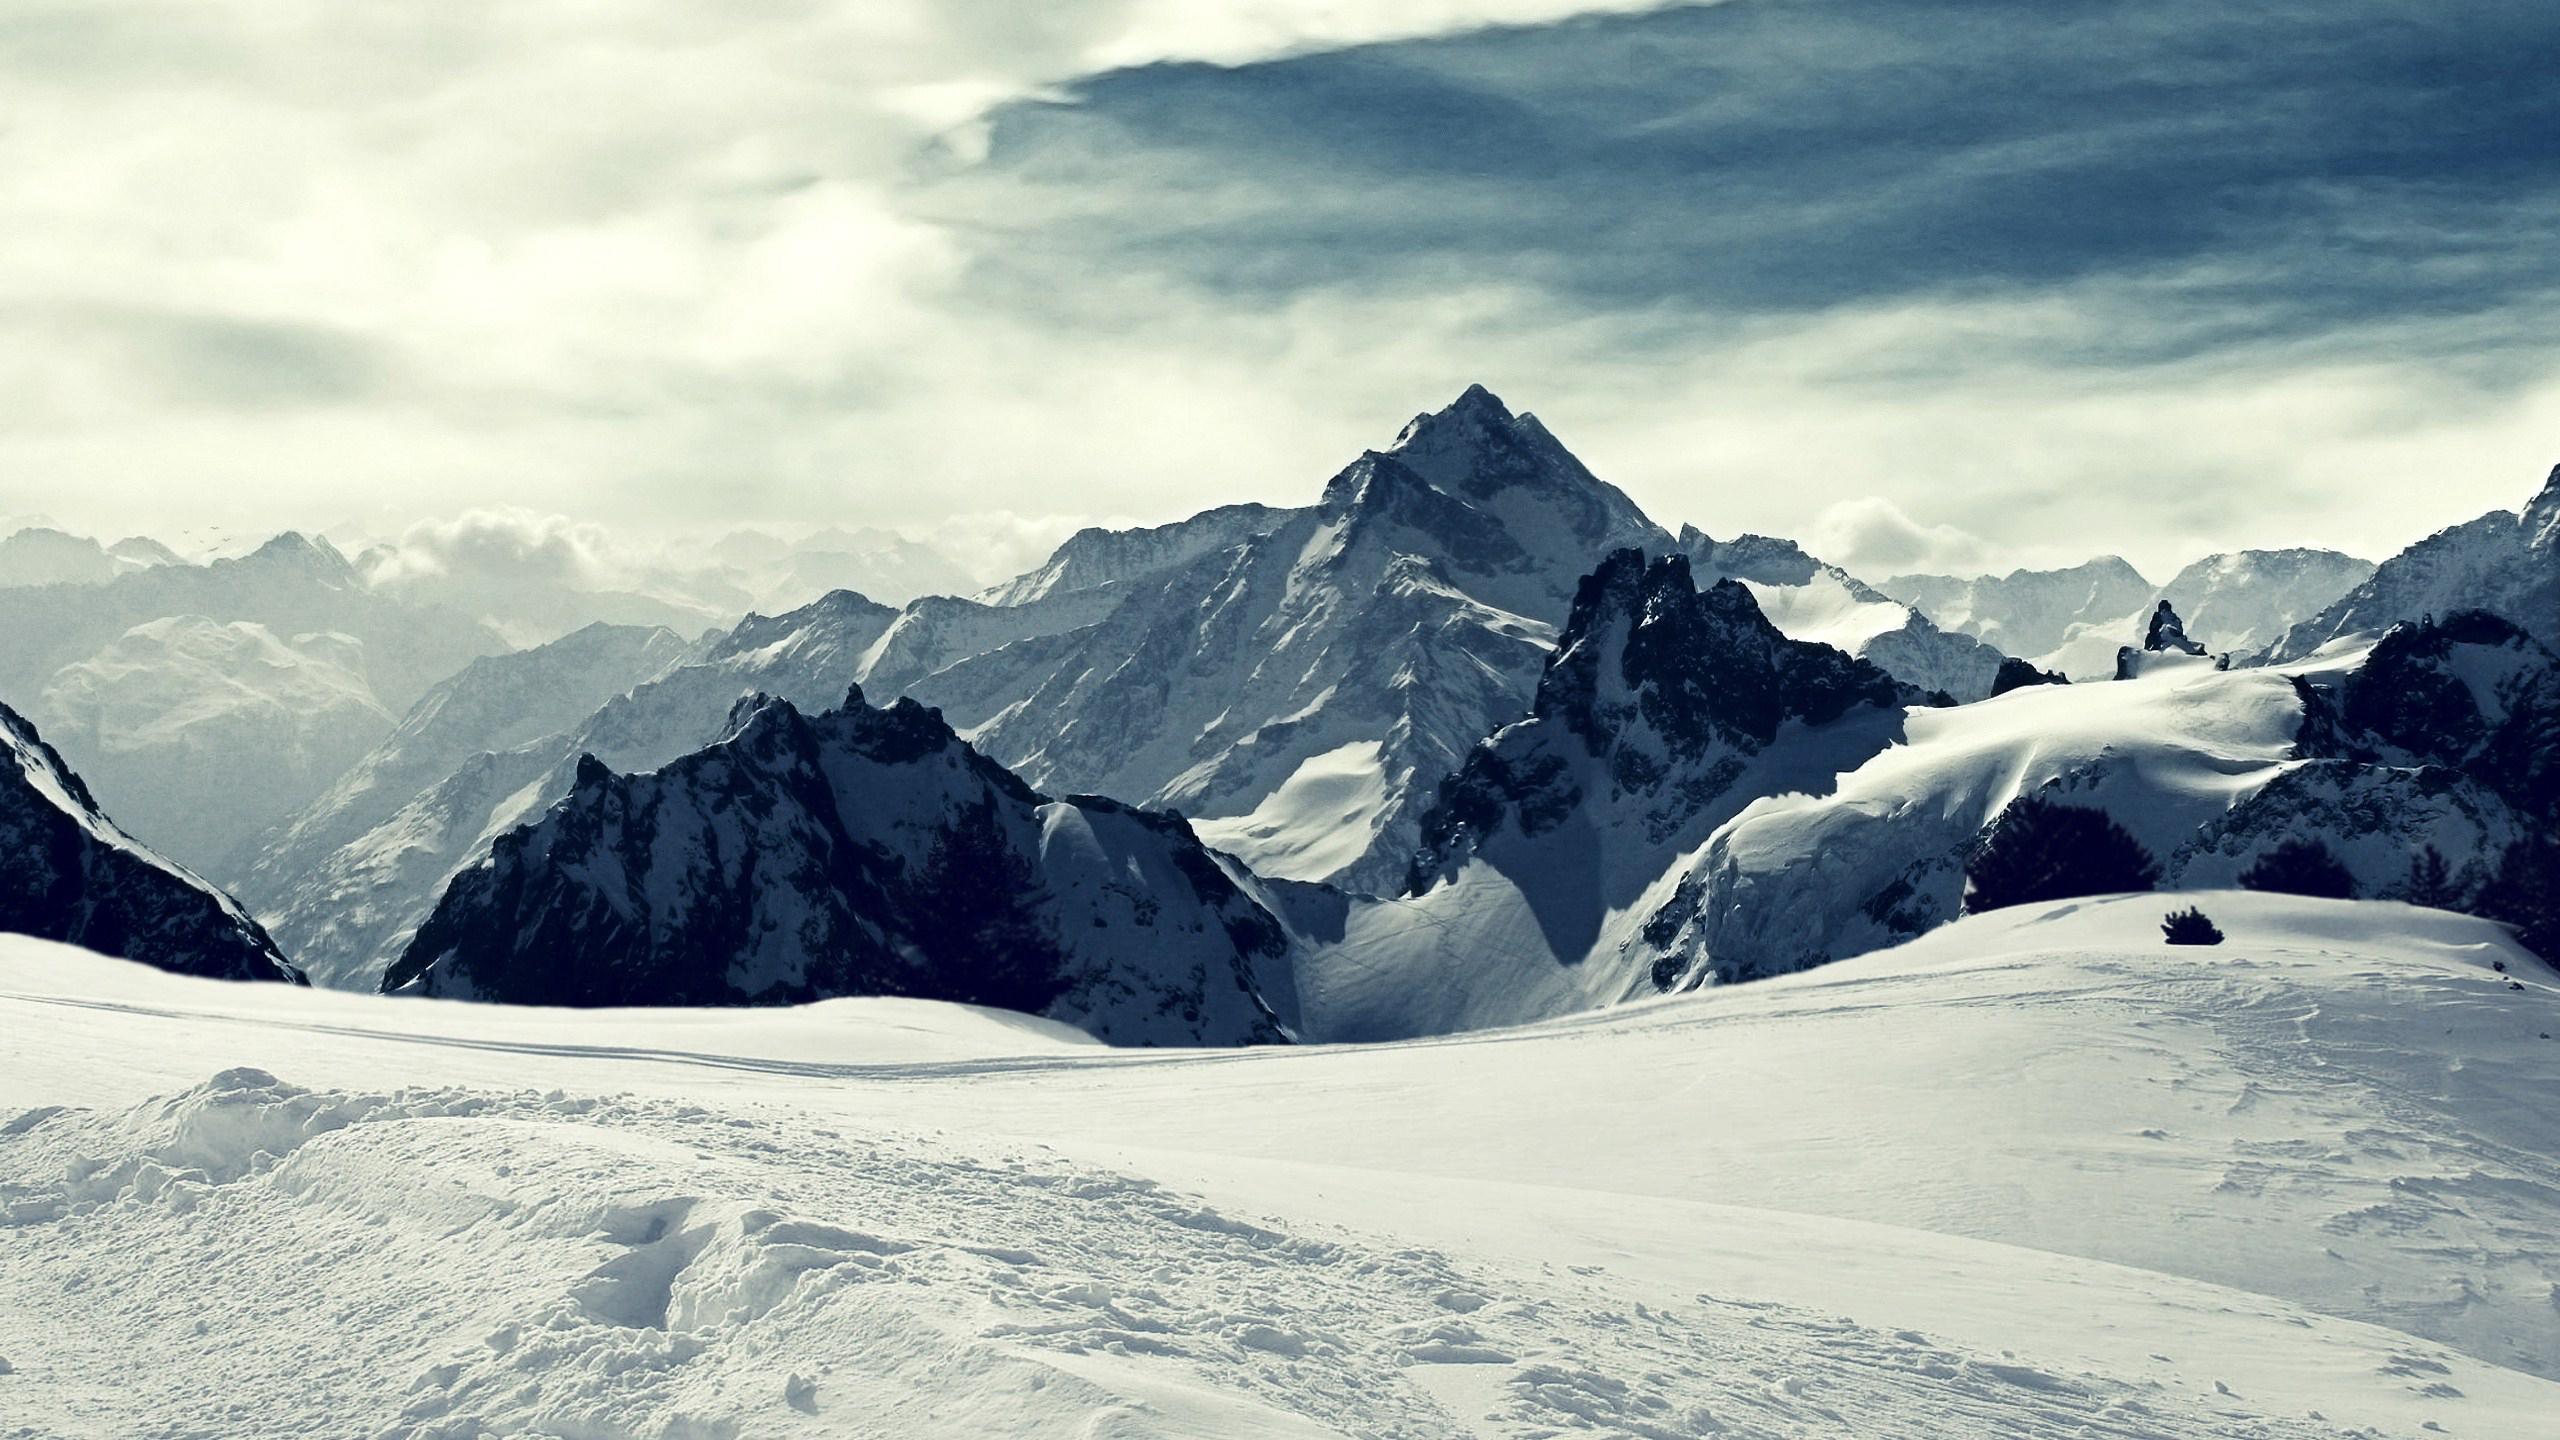 Mountain top photo